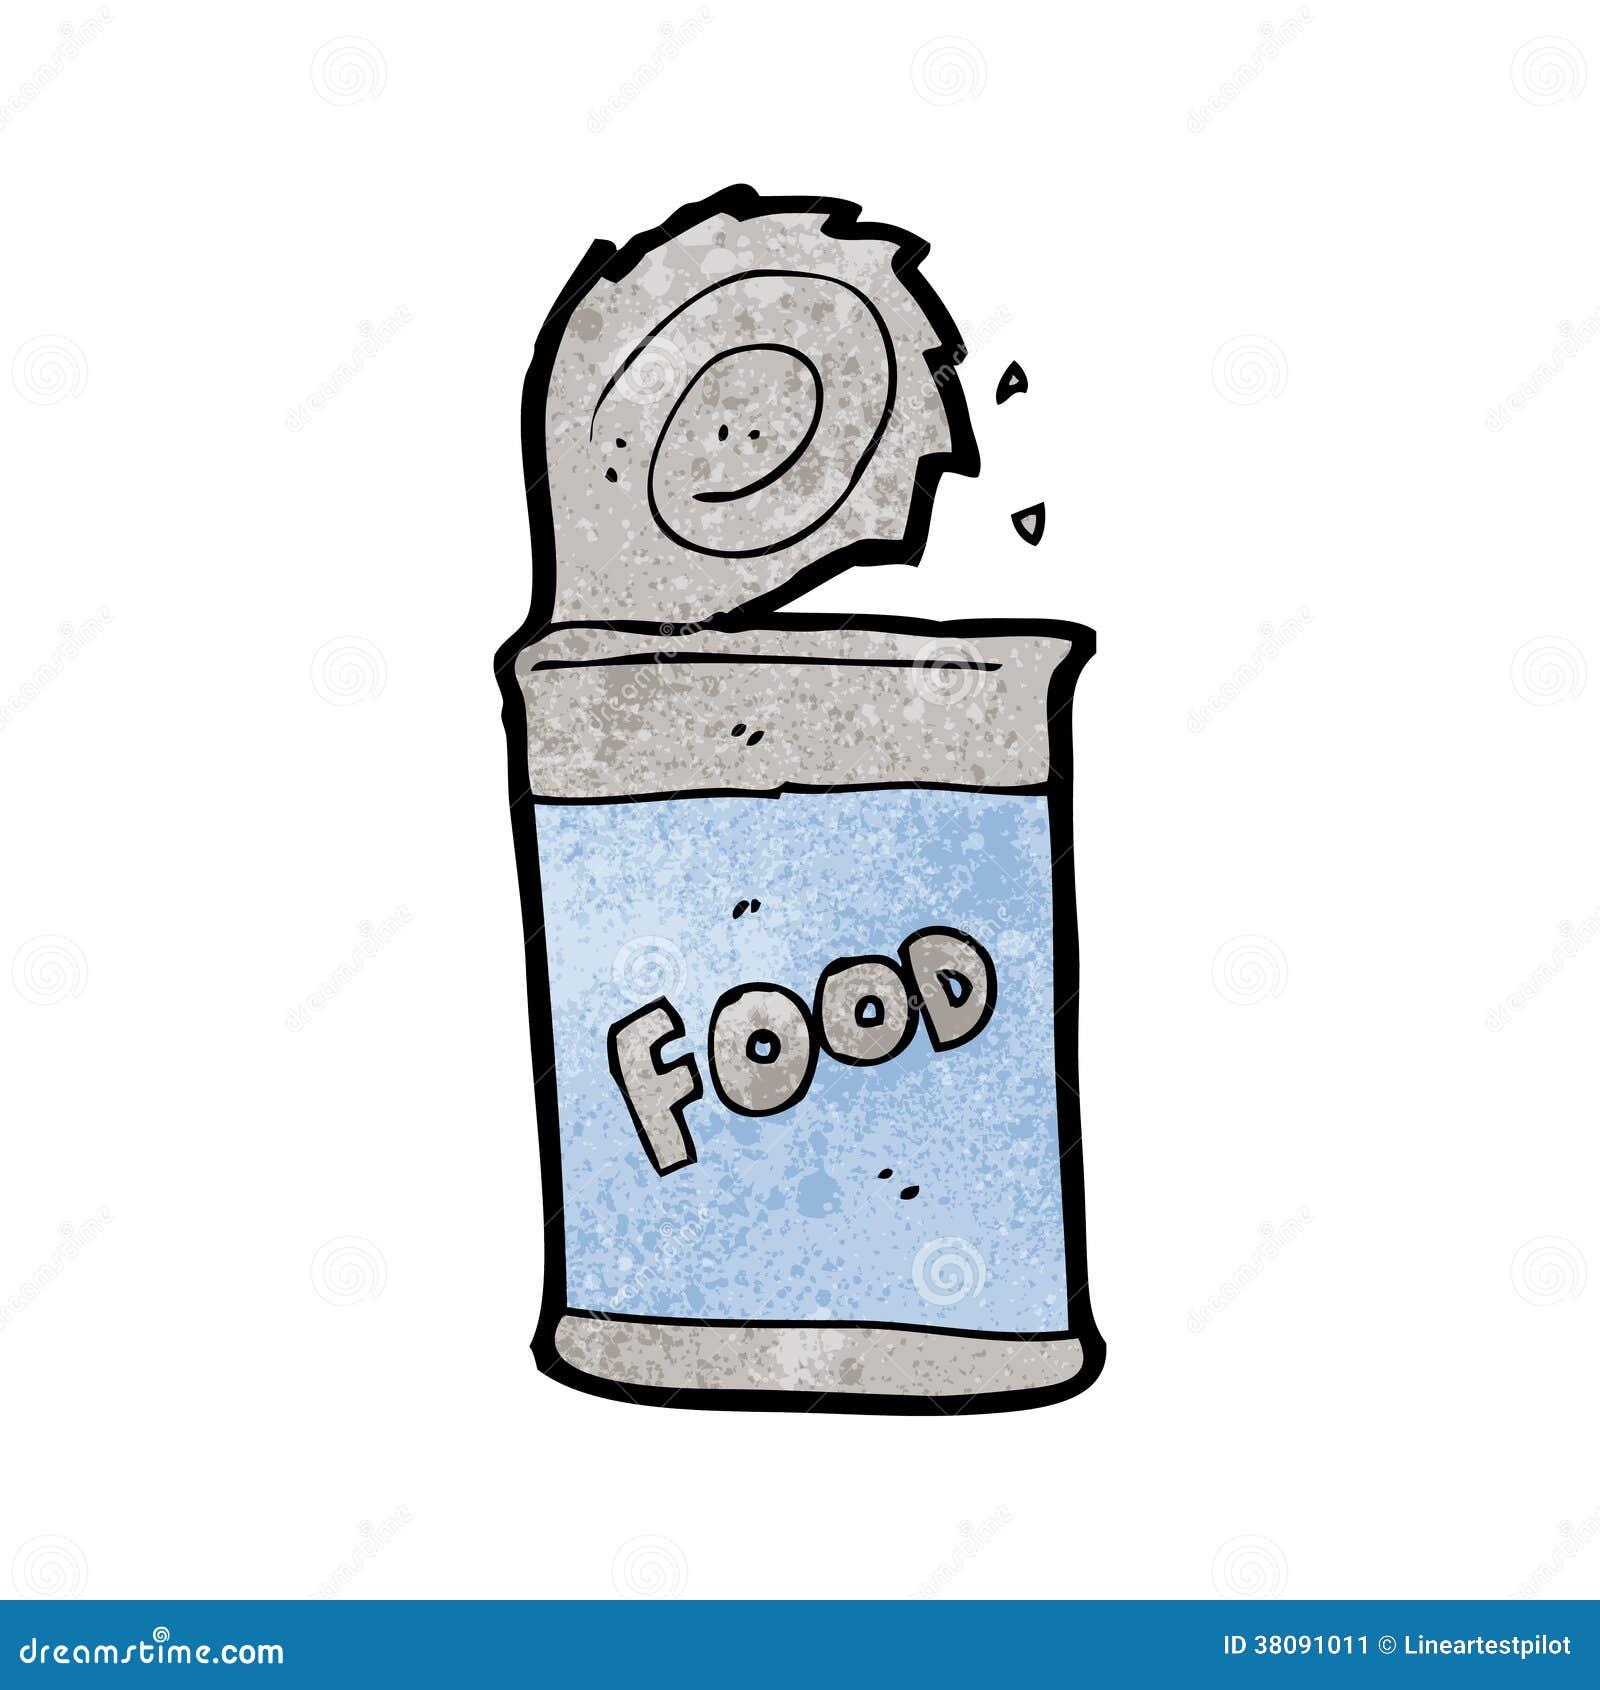 Cartoon Food Can Stock Image - Image: 38091011